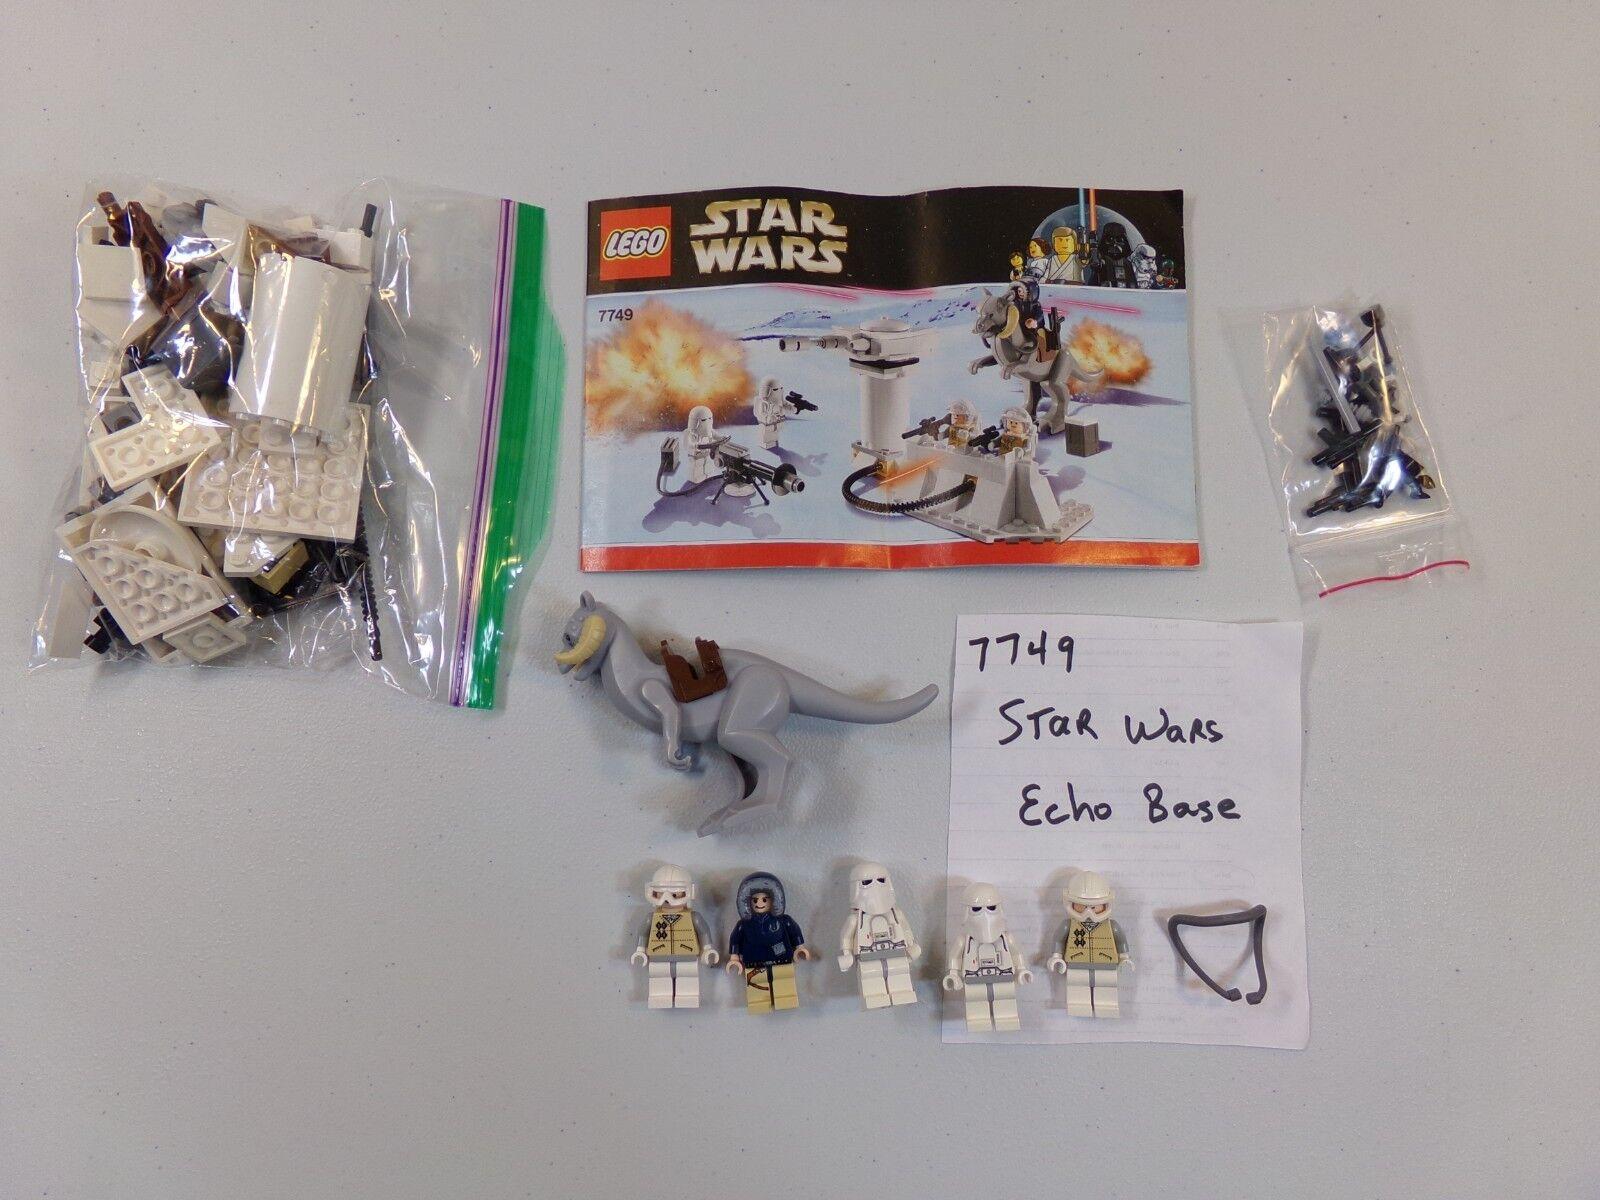 Lego 7749 Star Wars Echo Base - 100% Complete